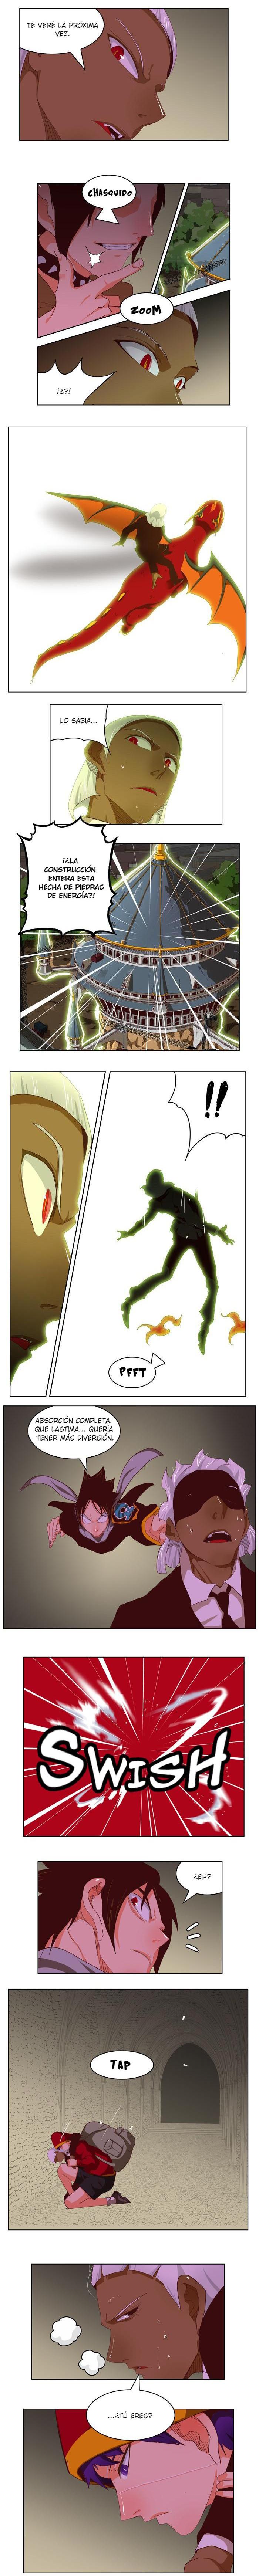 http://c5.ninemanga.com/es_manga/37/485/436630/413787bab7c3dcbc276cd40a4ce5b02d.jpg Page 3